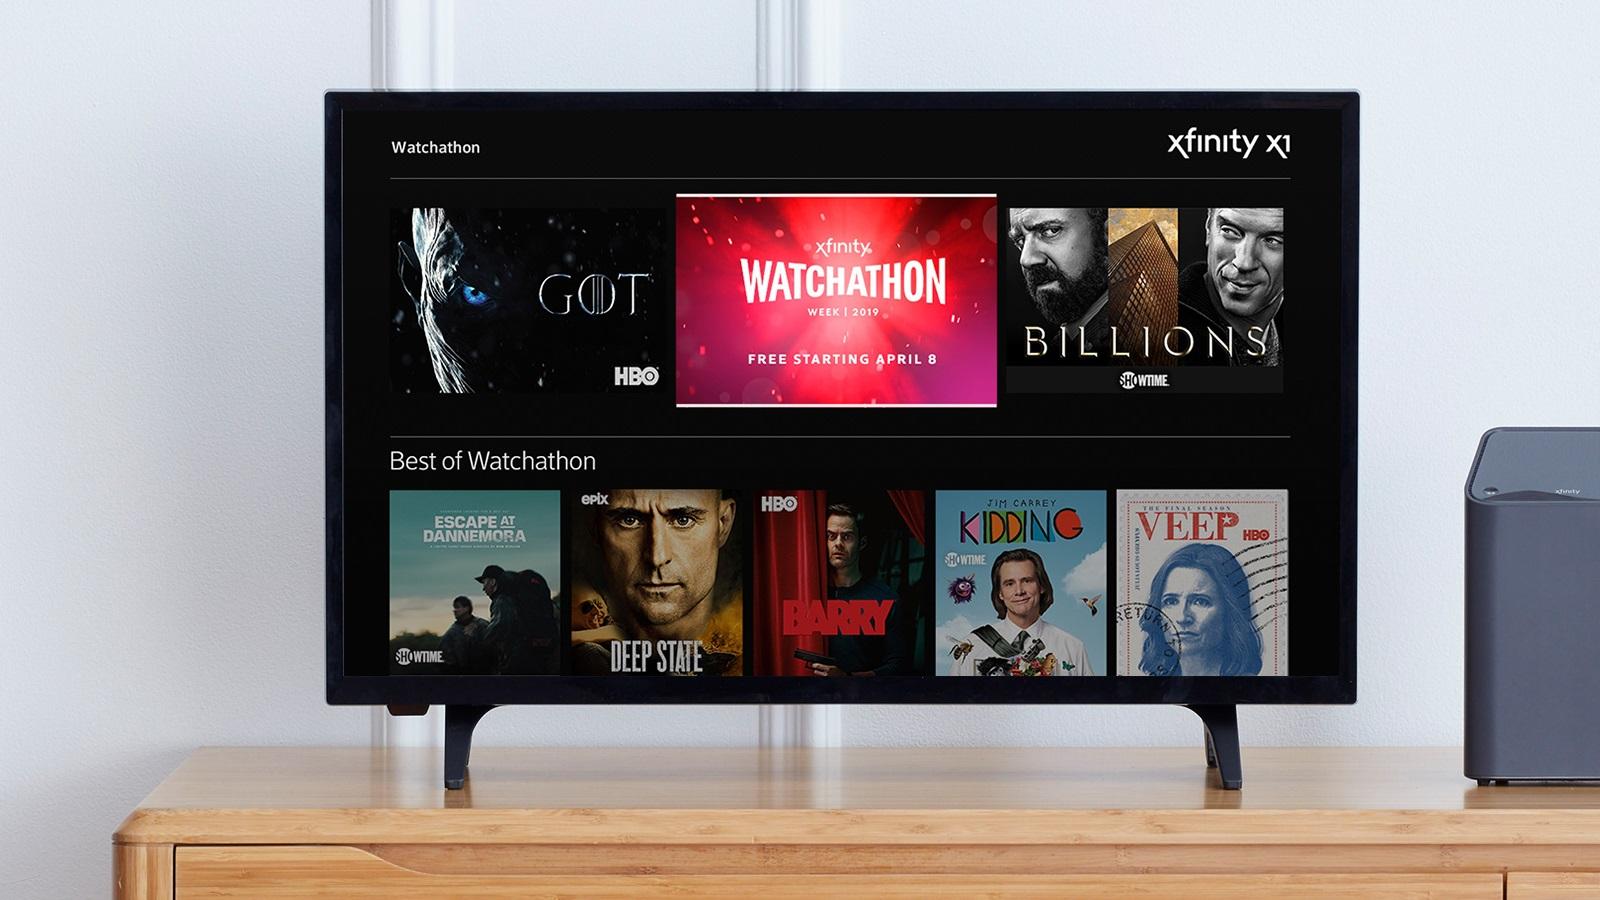 The Xfinity X1 Watchathon hub is displayed on a TV.